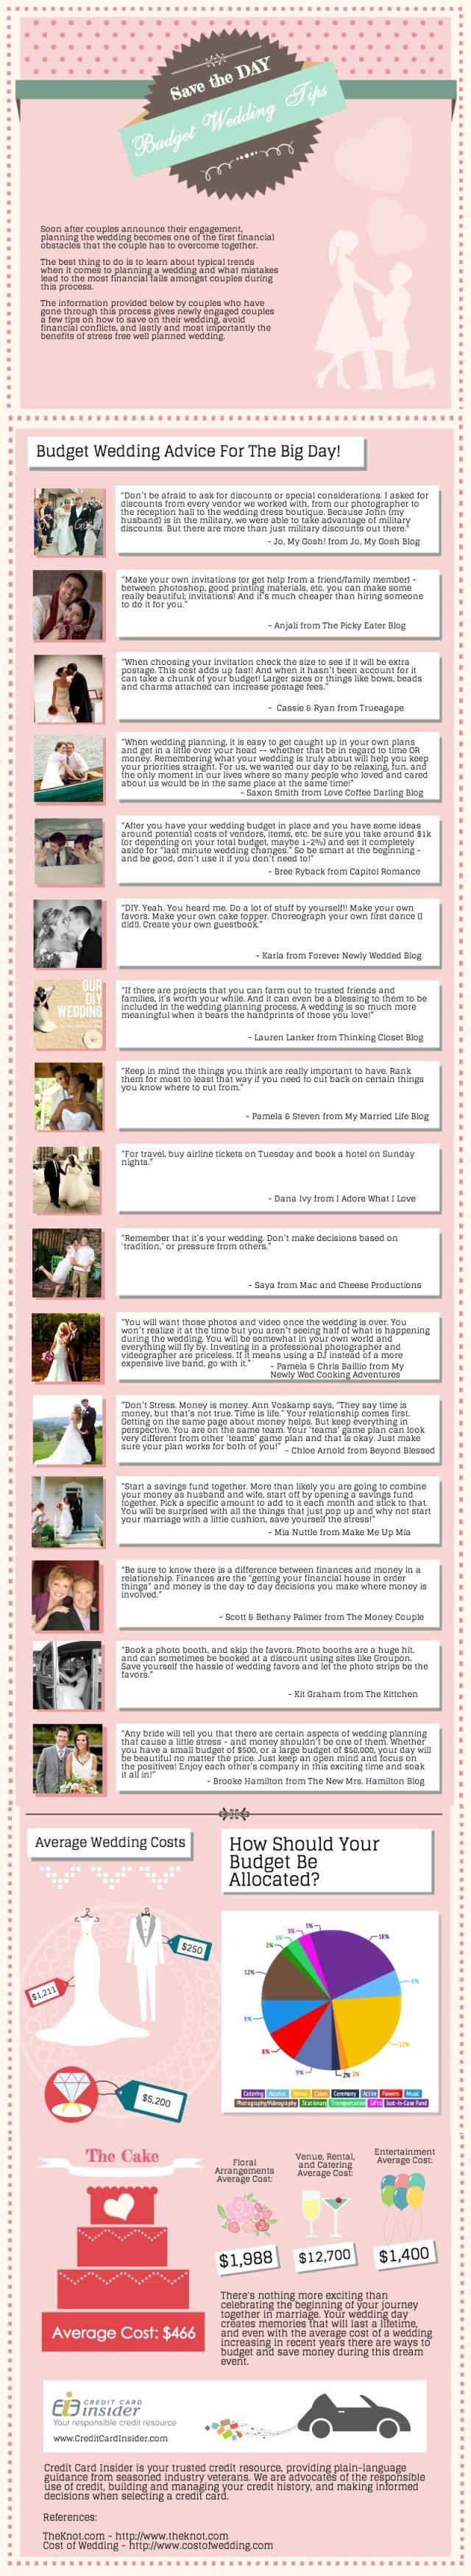 Wedding Budget Advice